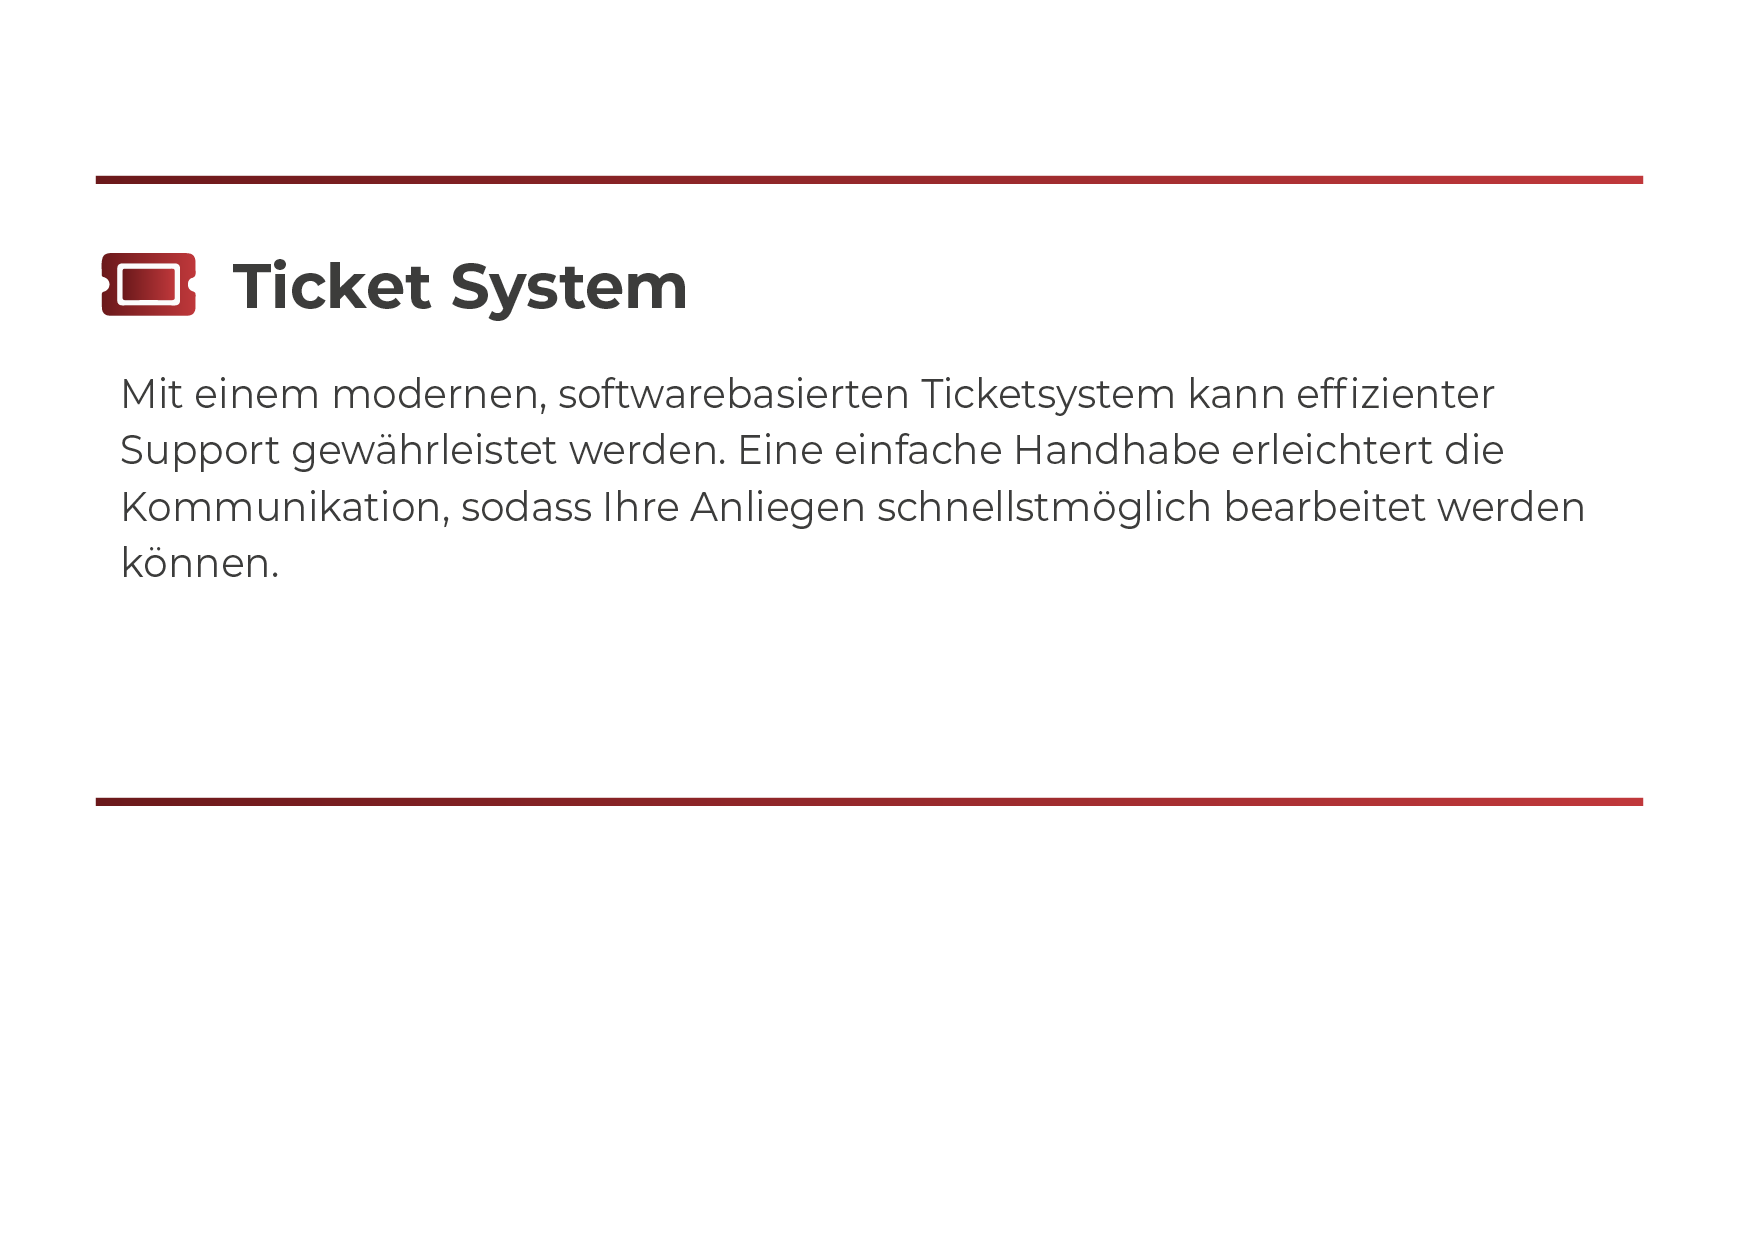 S_Ticket